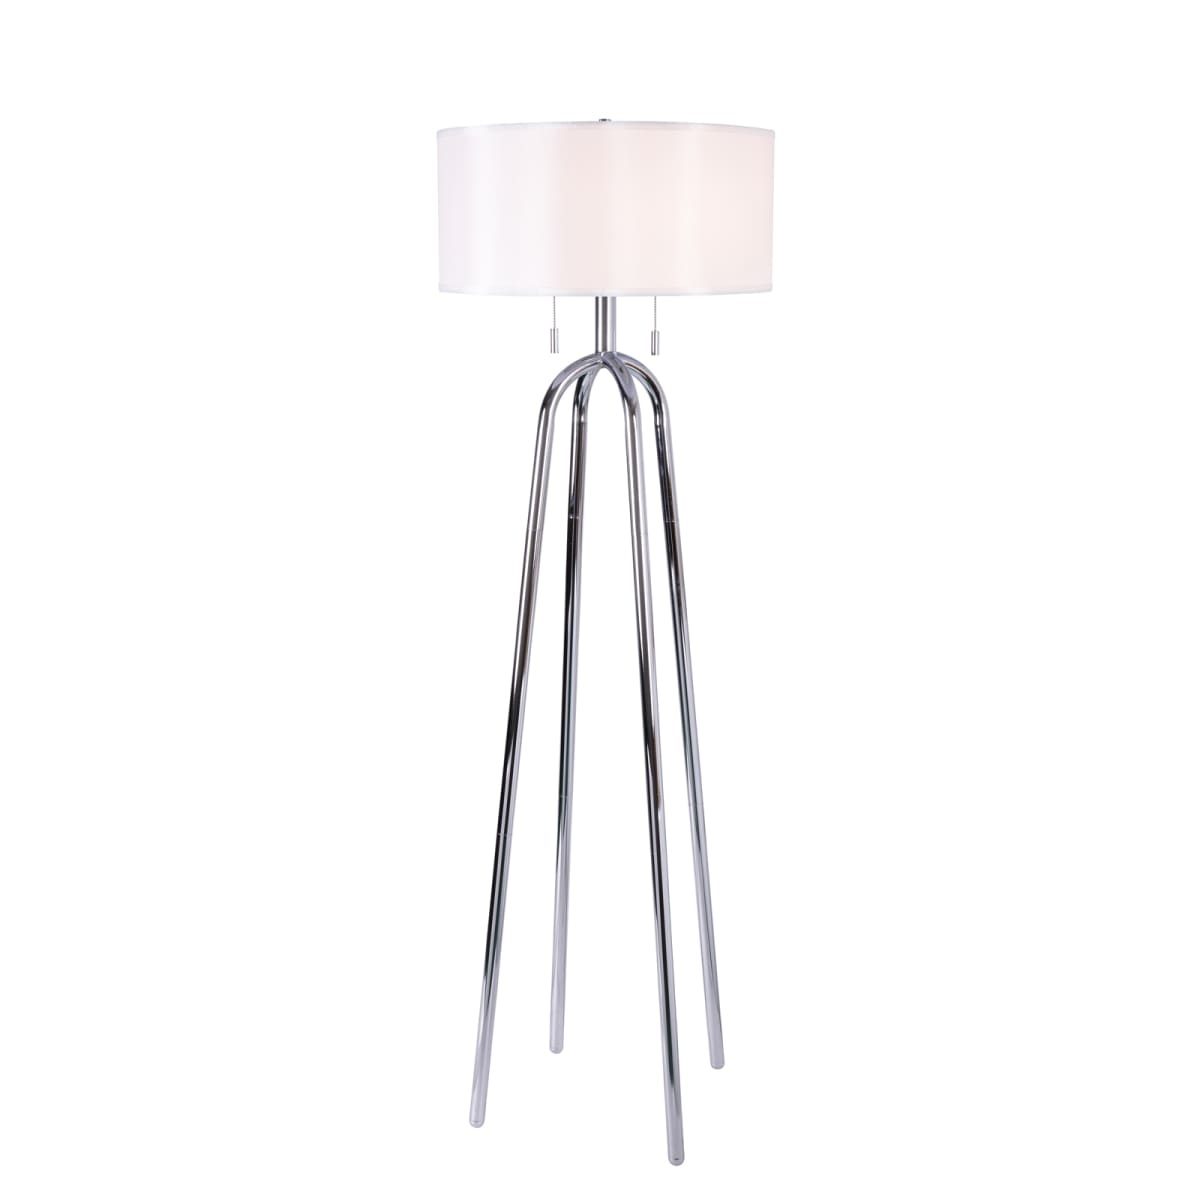 Kenroy Home 21389 Quadratic Lamps